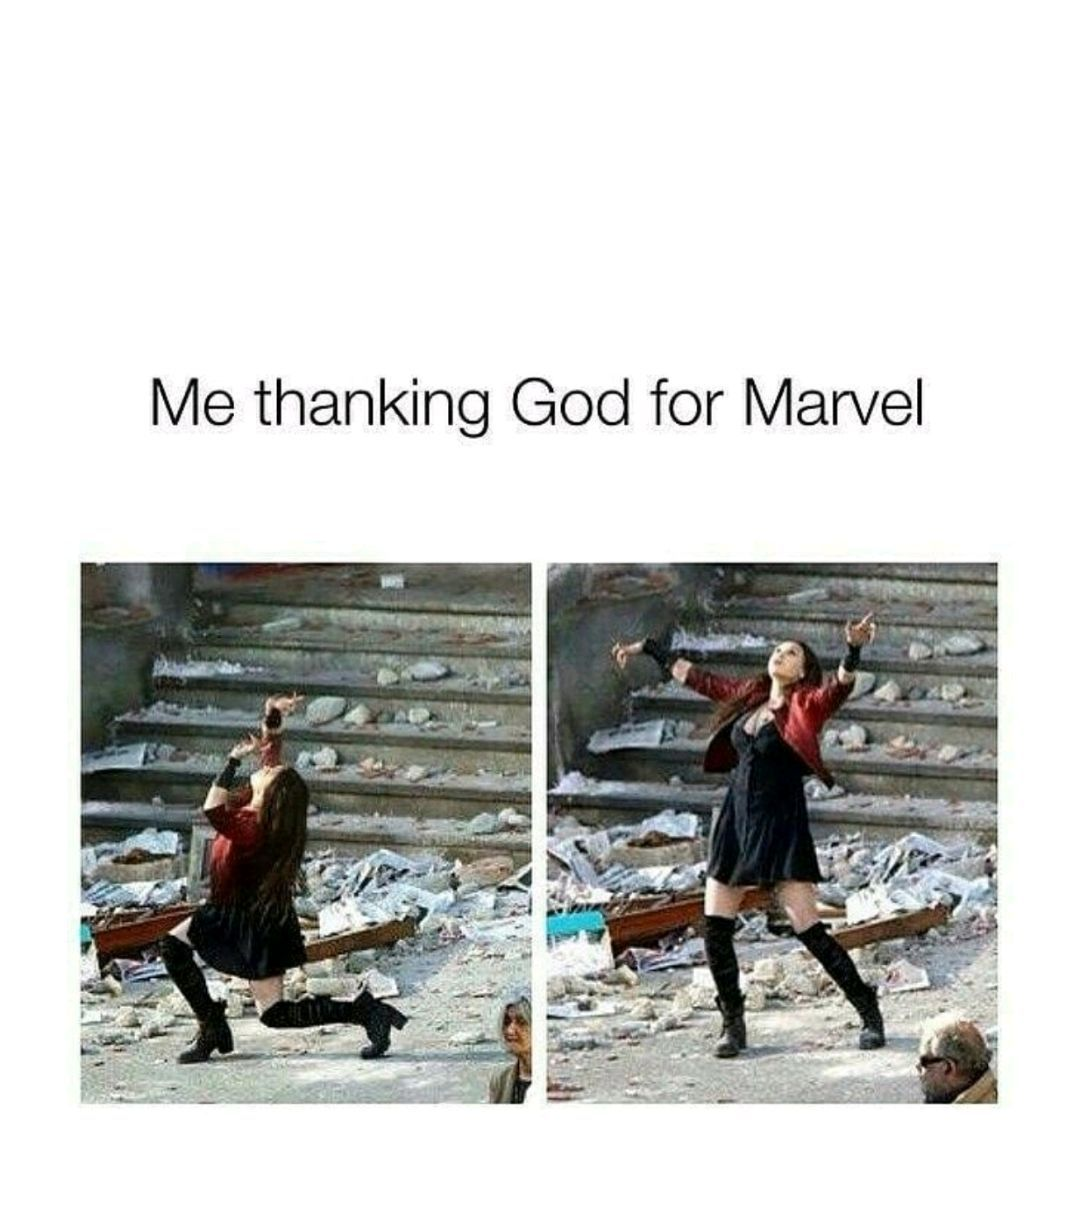 Everybody loves Marvel